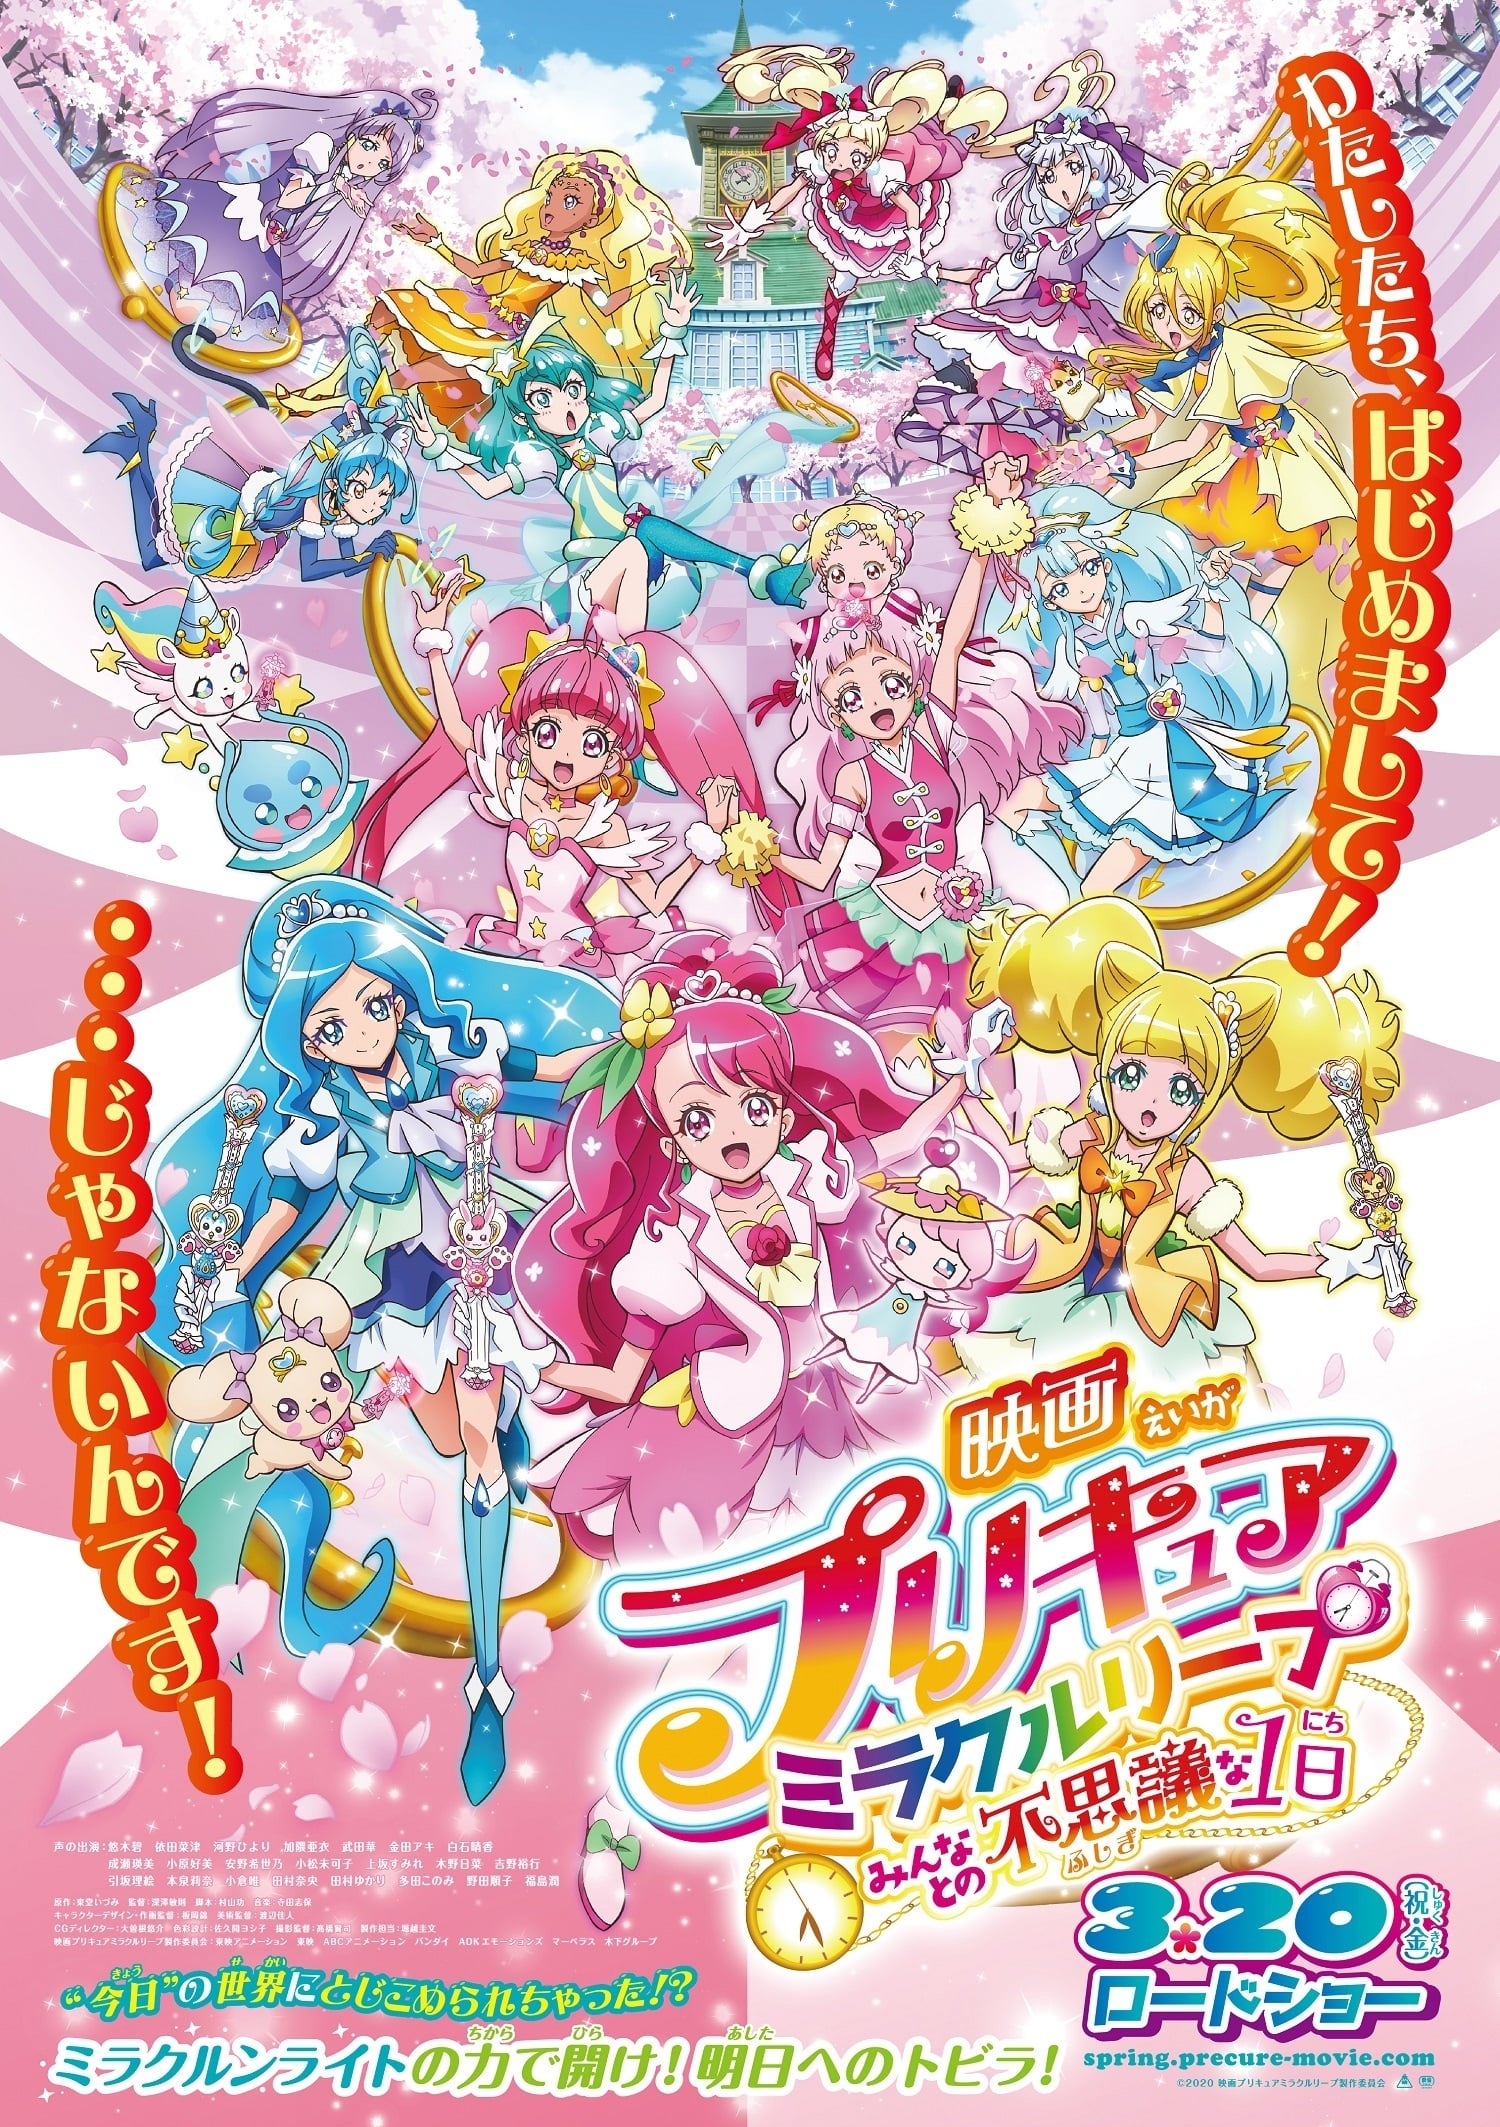 Precure Miracle Leap Movie: Minna to no Fushigi na Ichinichi (2020)